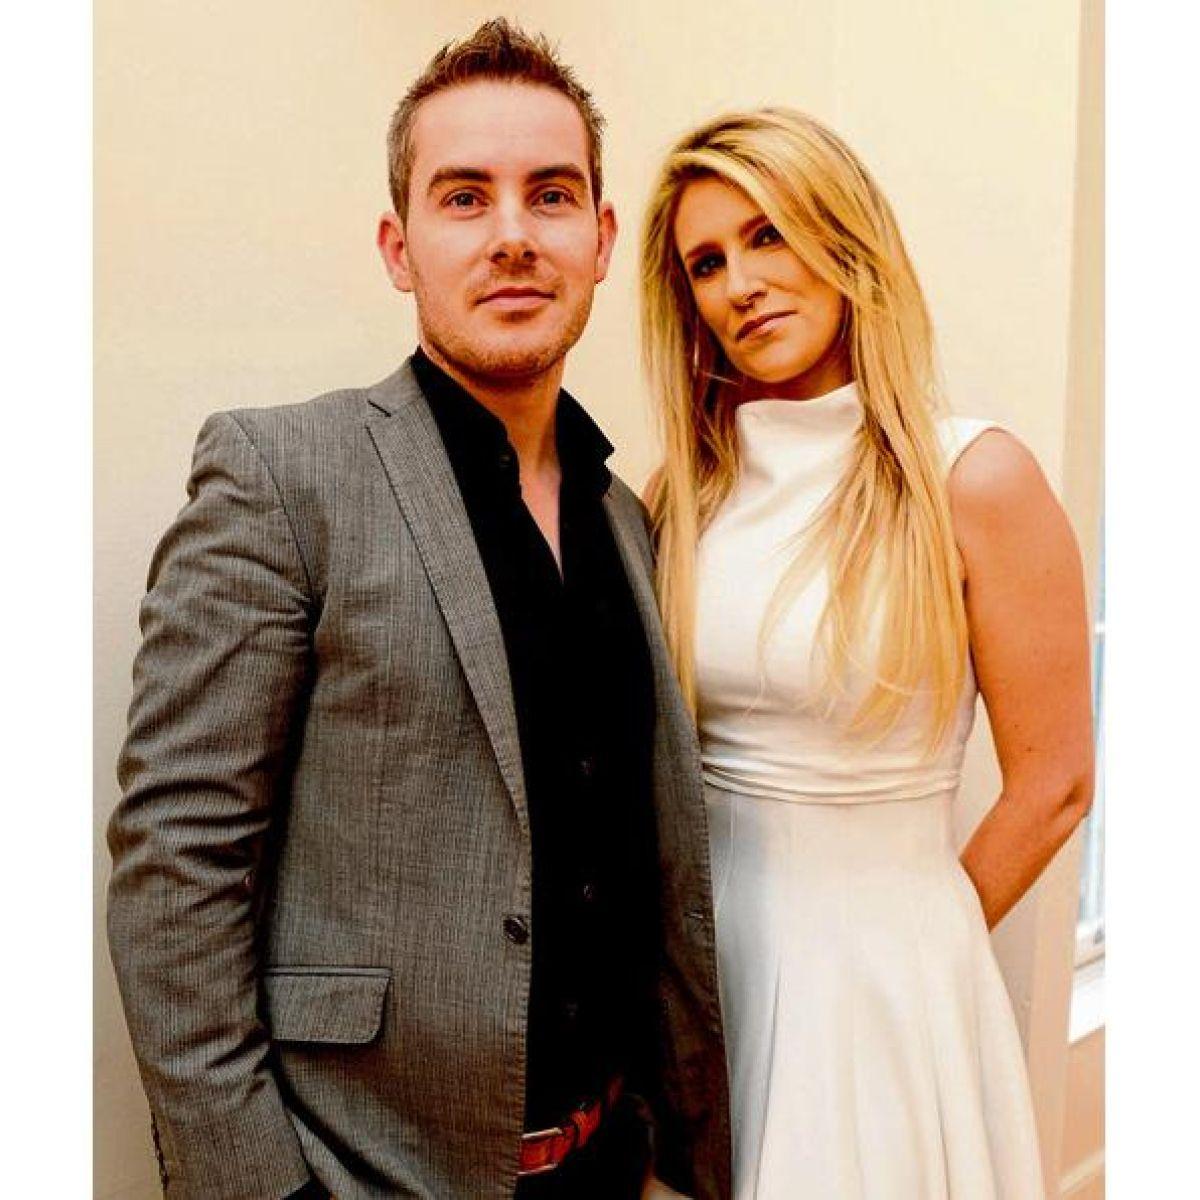 Speed Dating Dublin Tonight - Top 5 Singles Events in Dublin